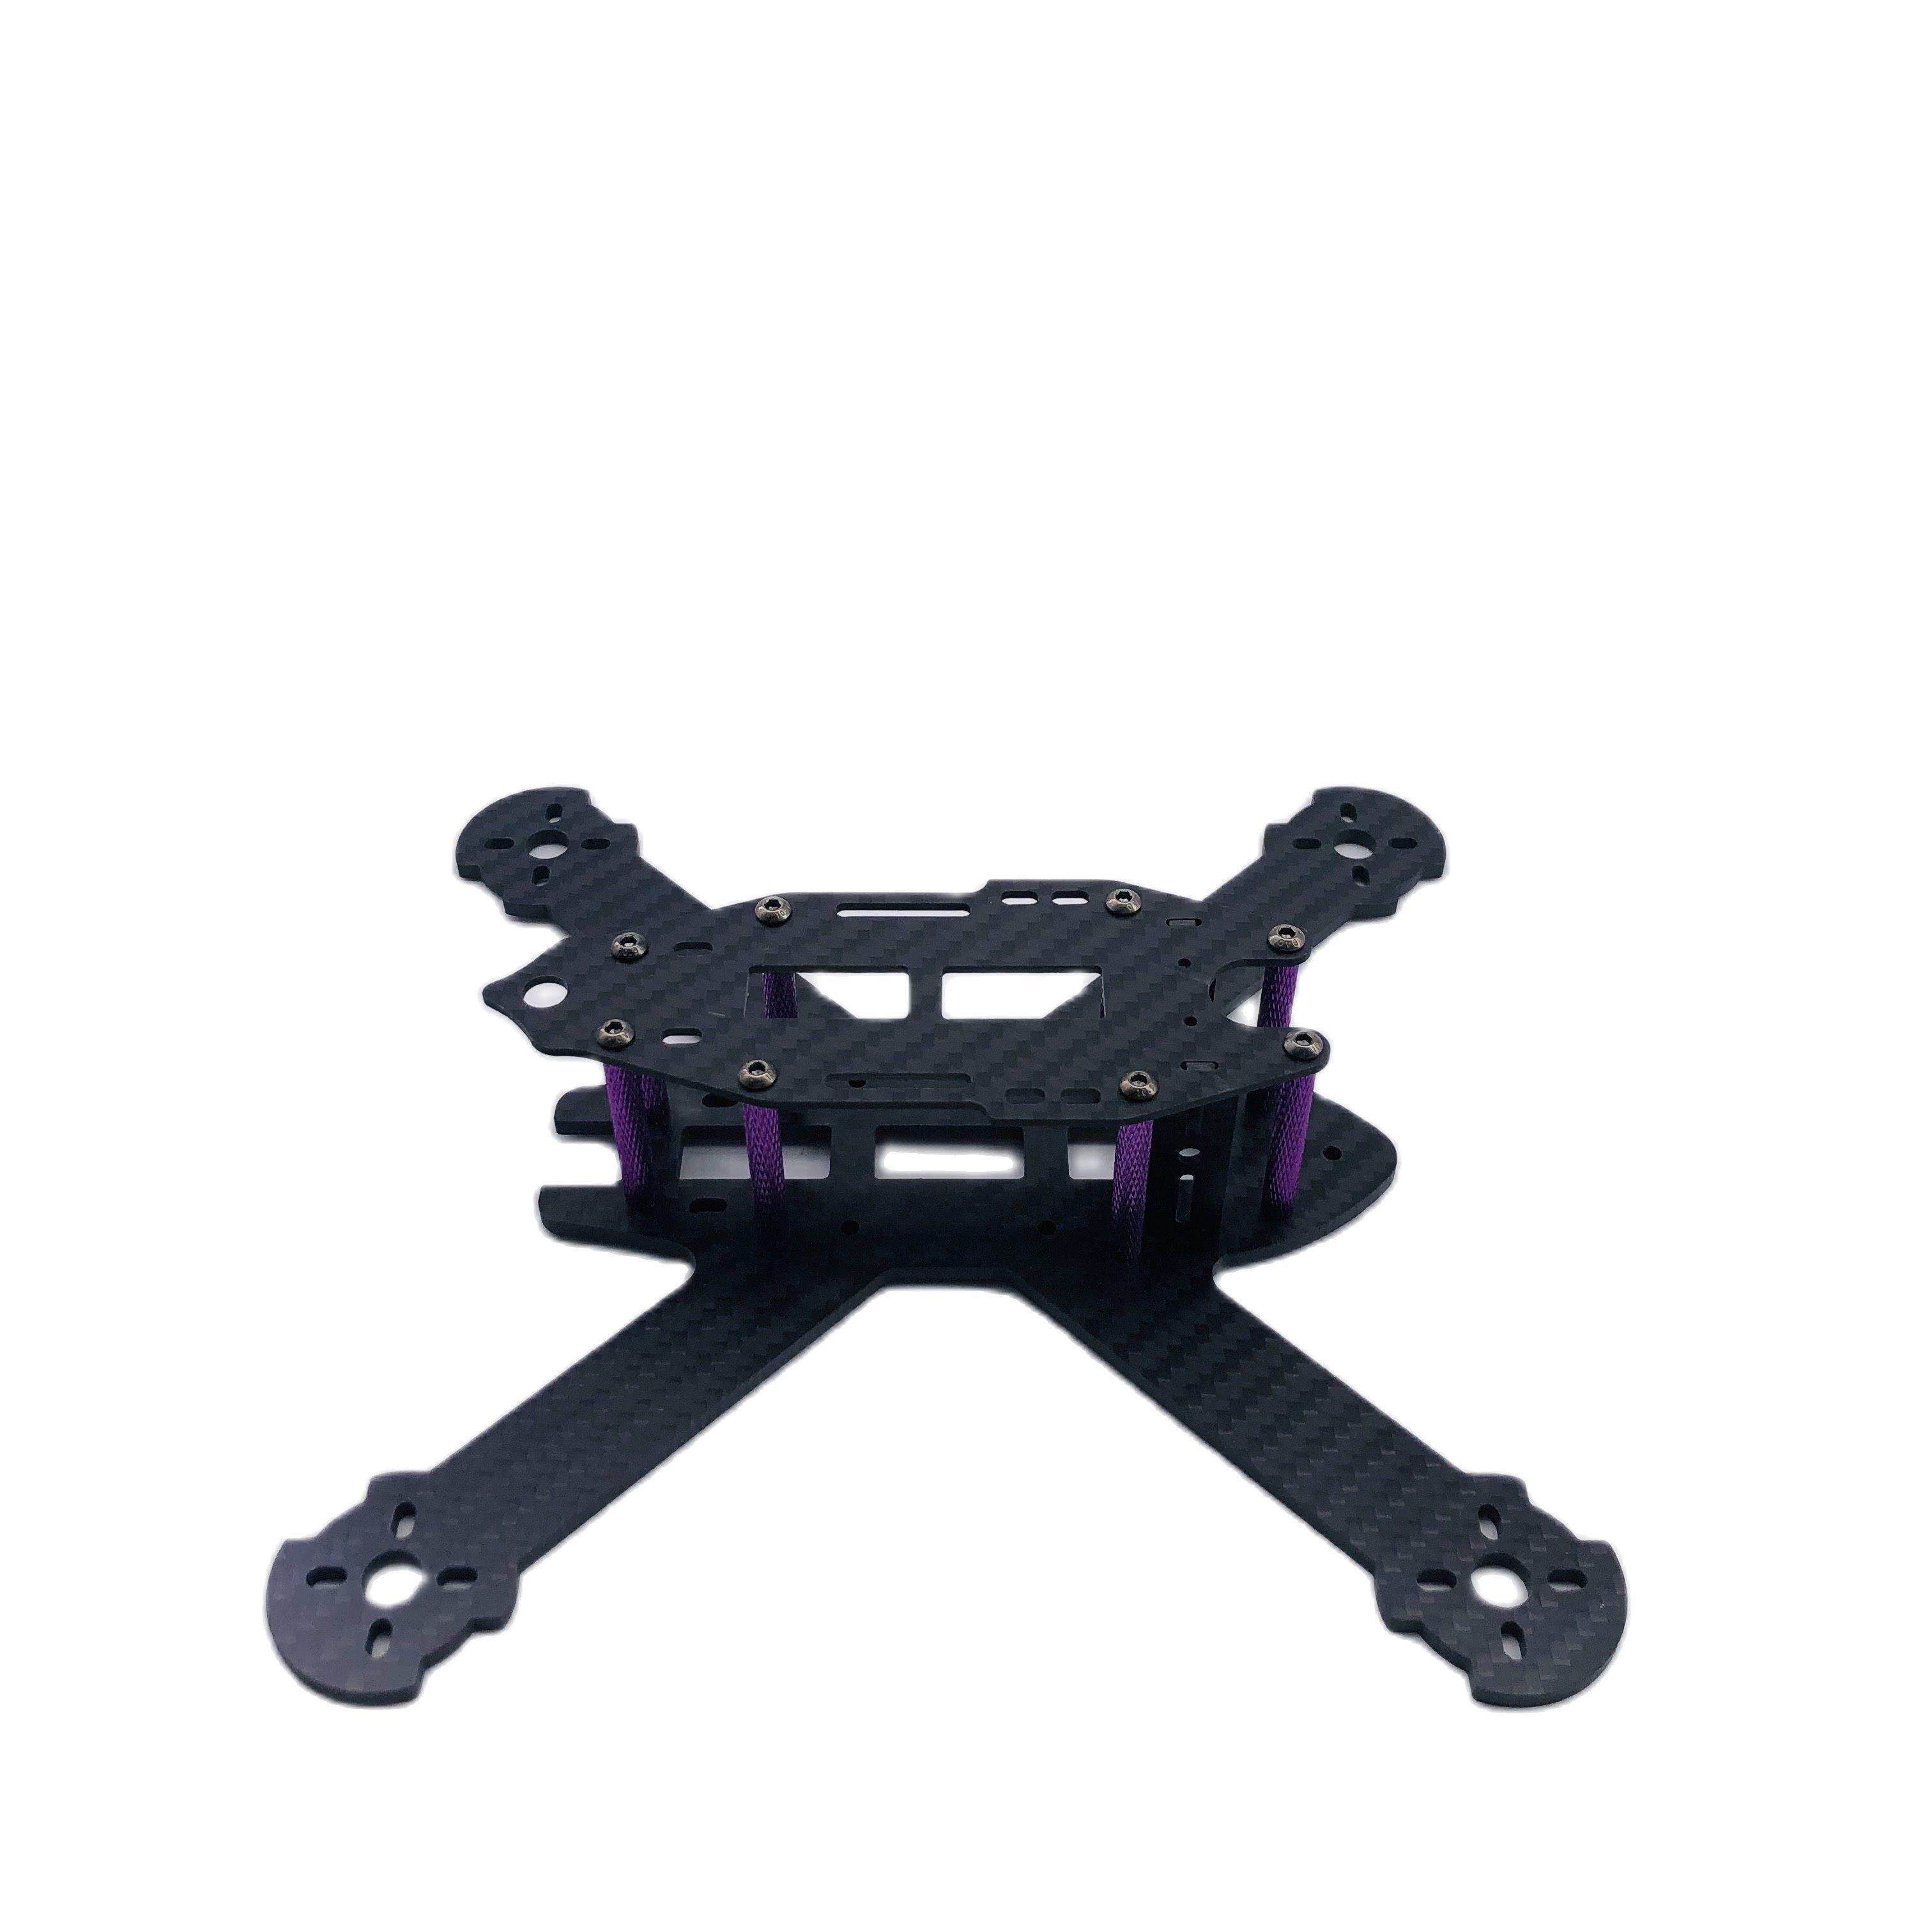 TCMMRC FPV Drone Frame 5.5 Inch FPV STAD Drone Frame, Wheel Base, 210mm, 3mm, Carbon Fiber Arm,+ F402D Flight Control DIY enlarge